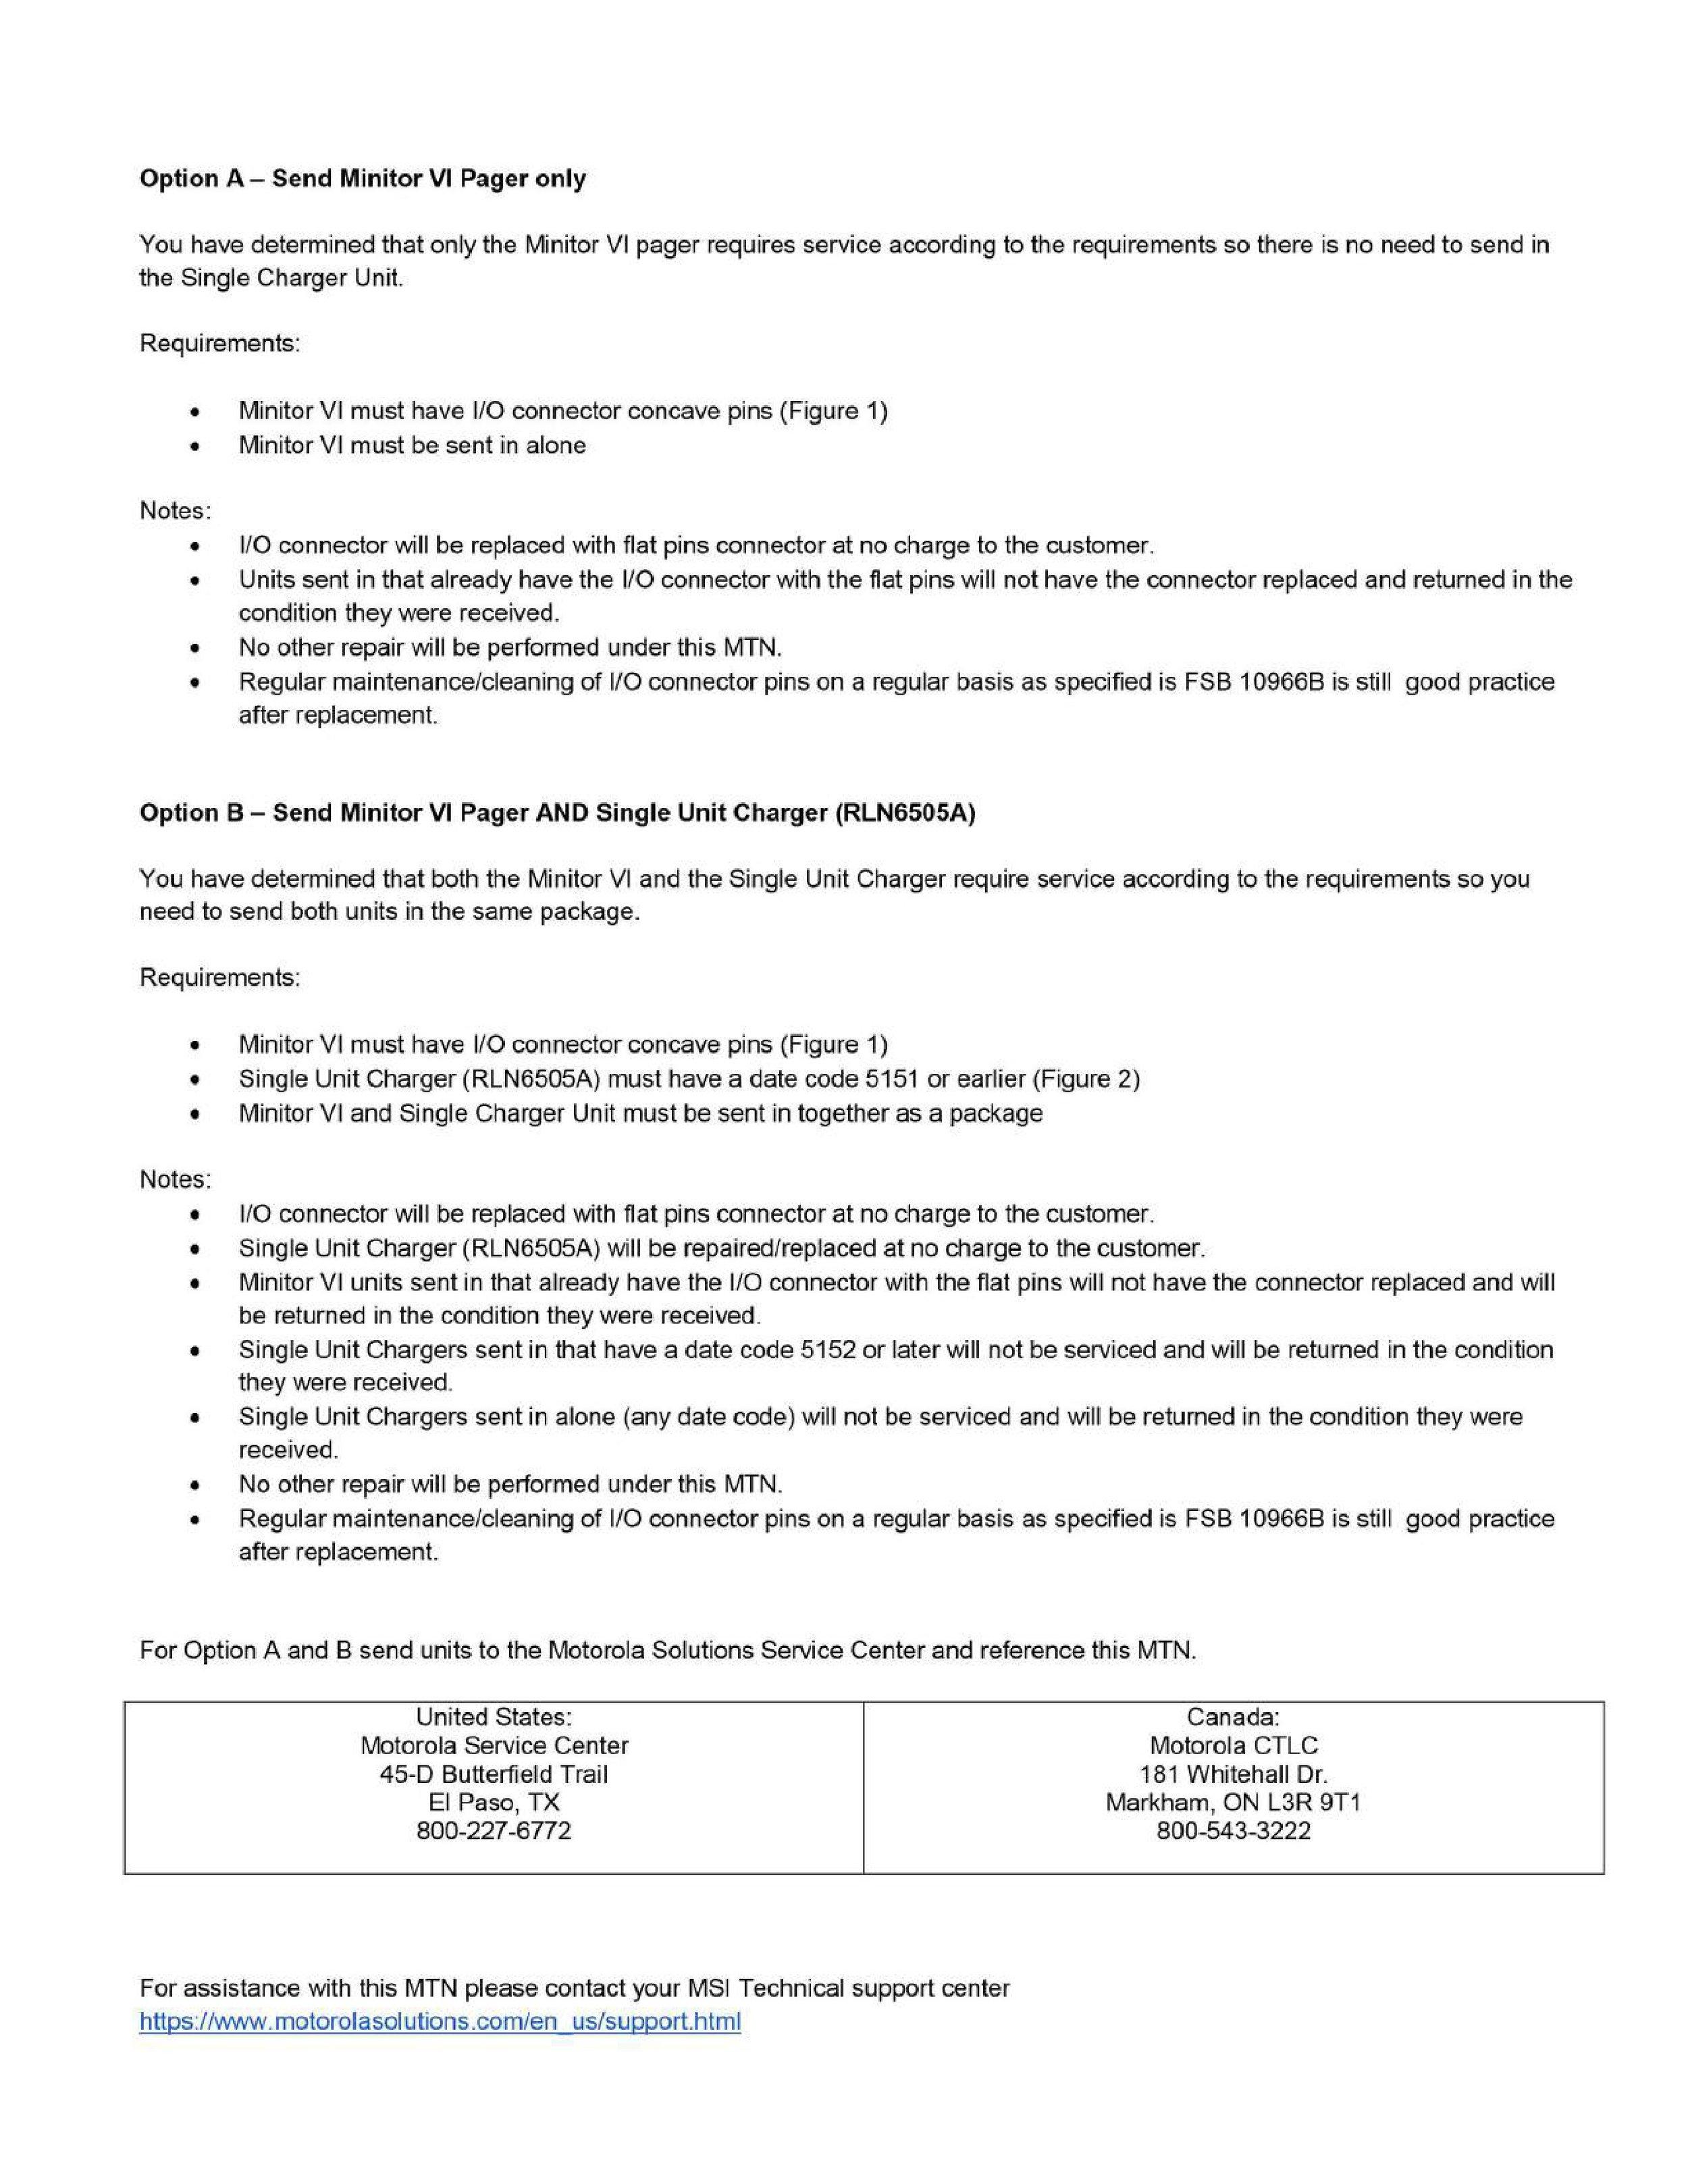 Motorola MTN Instructions_Min_VI Charging_C-page-3.jpg